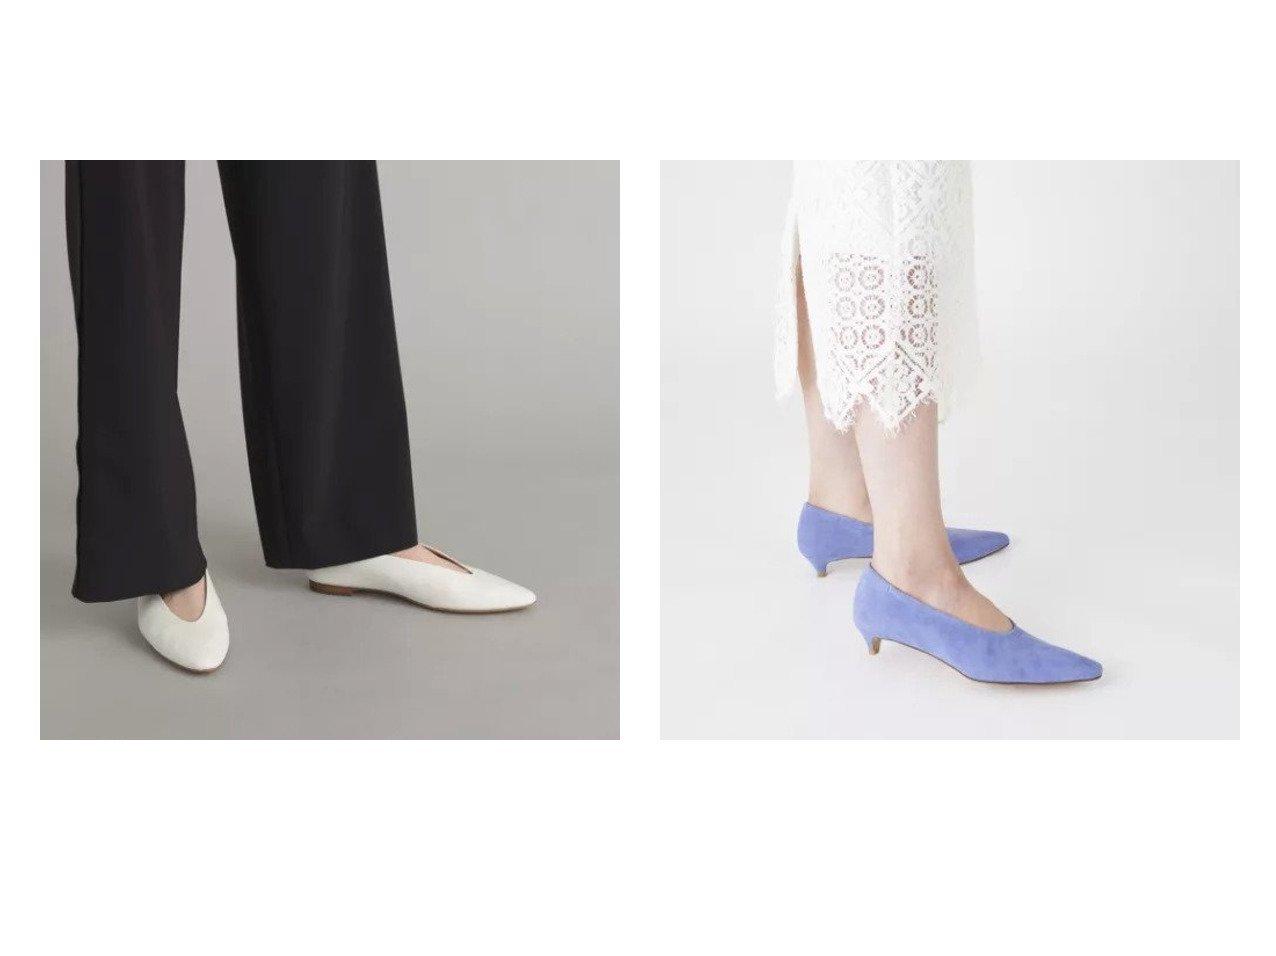 【Odette e Odile/オデット エ オディール】のOFD サプルカバー FLT10↓↑&OFD ストレッチトップソフト パンプス30↑ 【シューズ・靴】おすすめ!人気トレンド・レディースファッションの通販  おすすめで人気の流行・トレンド、ファッションの通販商品 メンズファッション・キッズファッション・インテリア・家具・レディースファッション・服の通販 founy(ファニー) https://founy.com/ ファッション Fashion レディースファッション WOMEN シューズ ストレッチ フィット フラット 人気 |ID:crp329100000029619